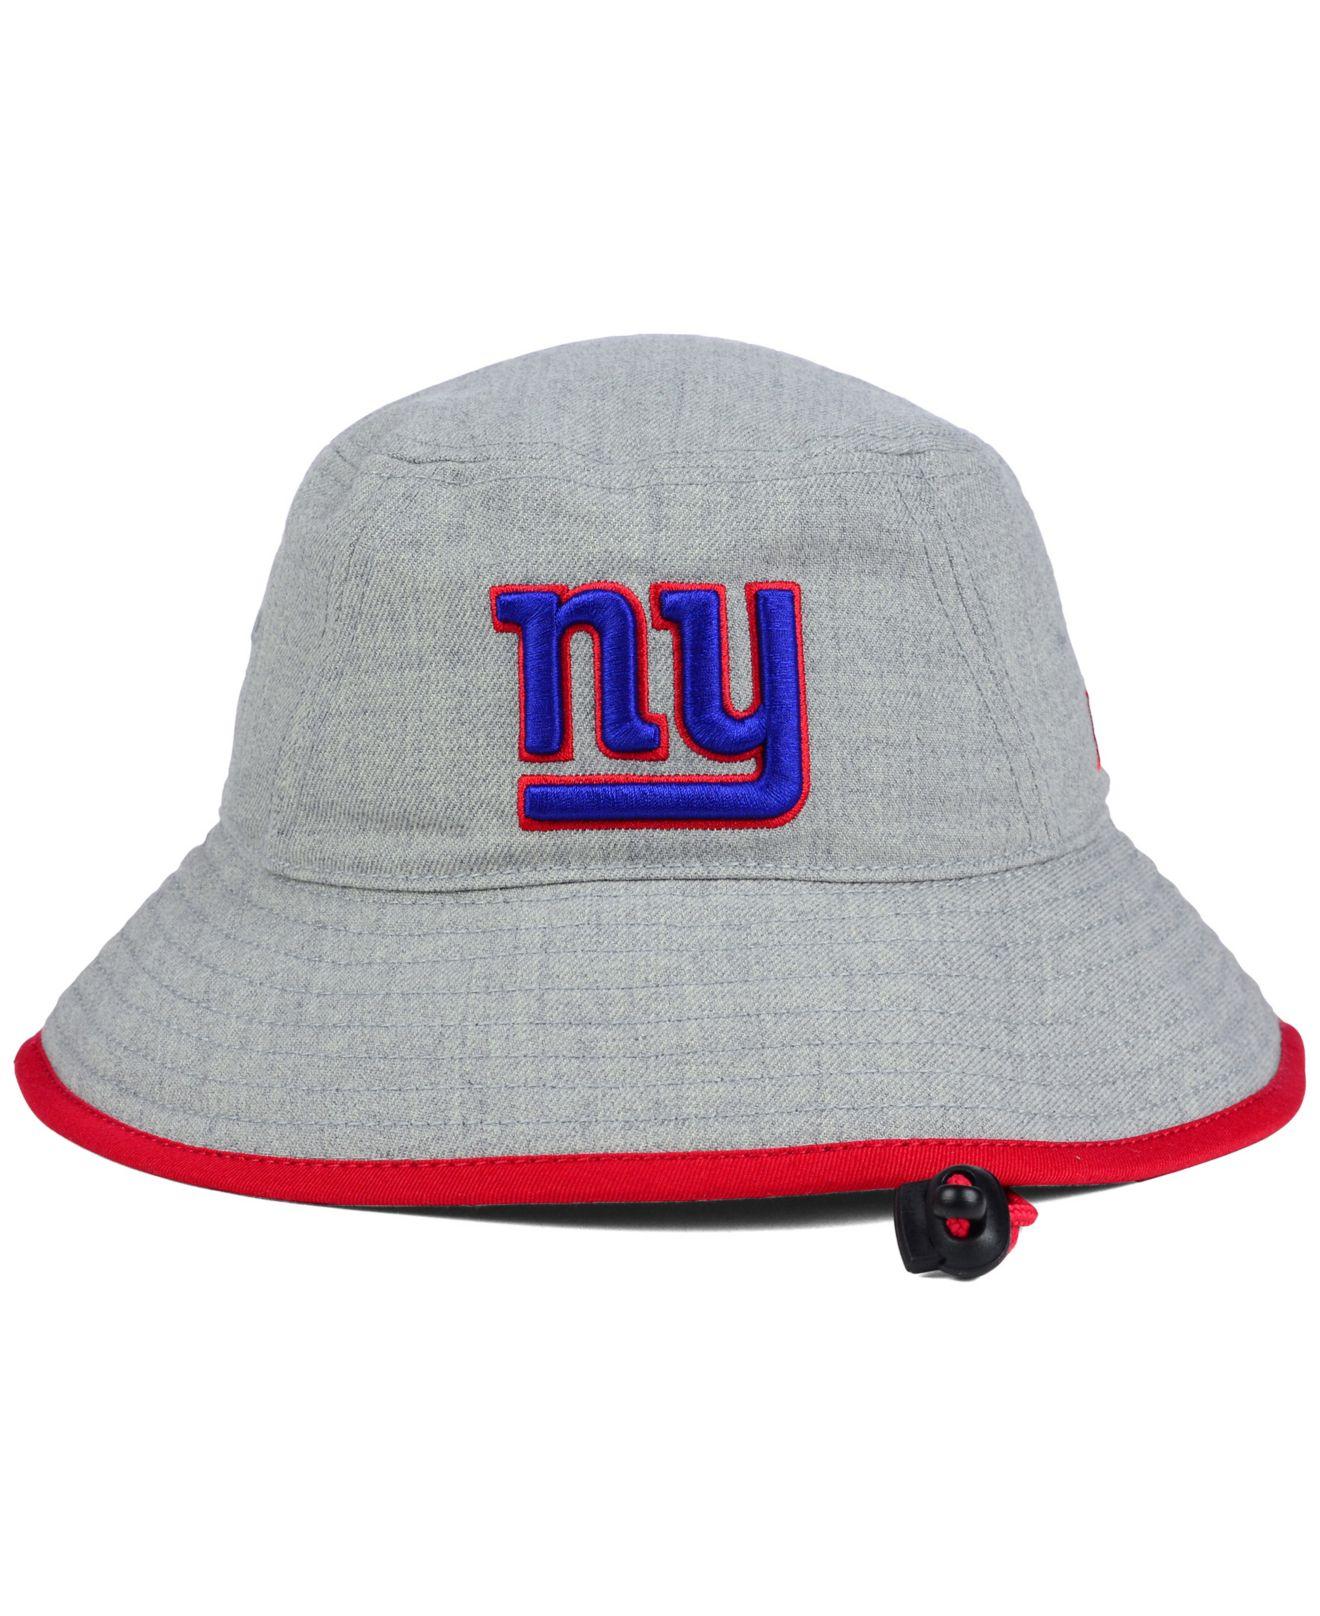 Lyst - KTZ New York Giants Nfl Heather Gray Bucket Hat in Gray c837b2fde